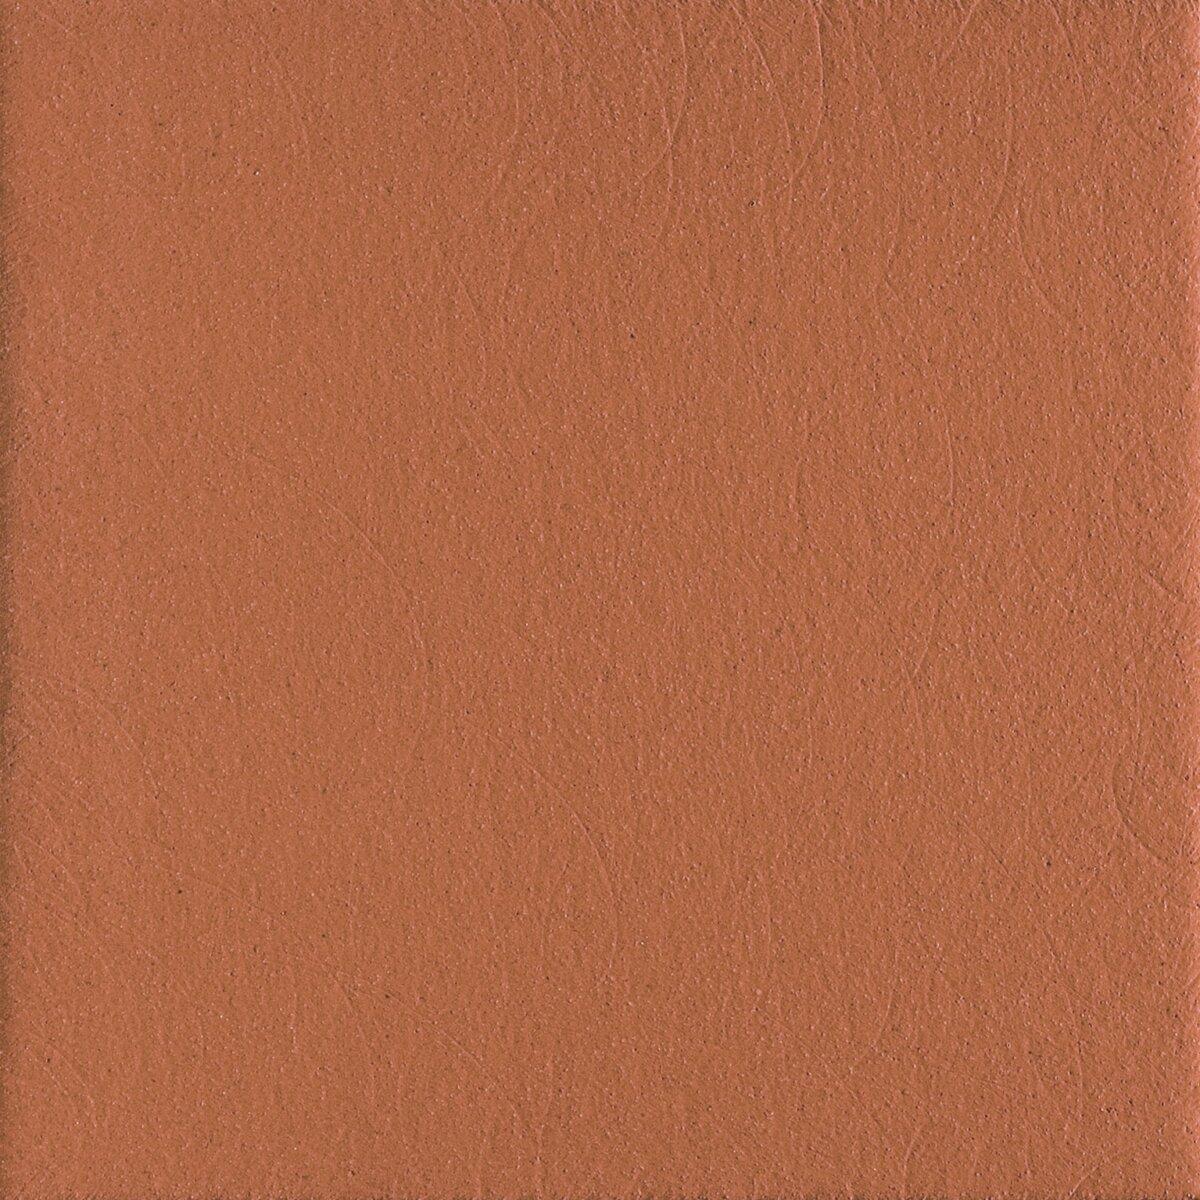 Domus Linea Piastrella Terracotta Arrotato 300x300mm_Stiles_Product_Image